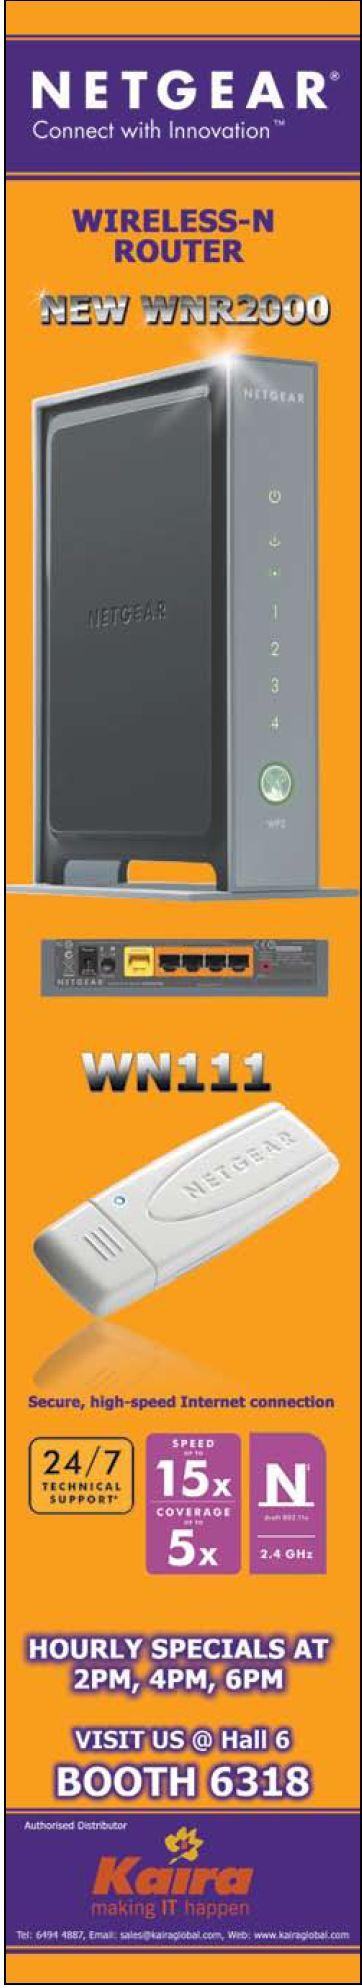 Comex 2008 price list image brochure of Netgear Wireless N Wnr2000 Wn1112 2